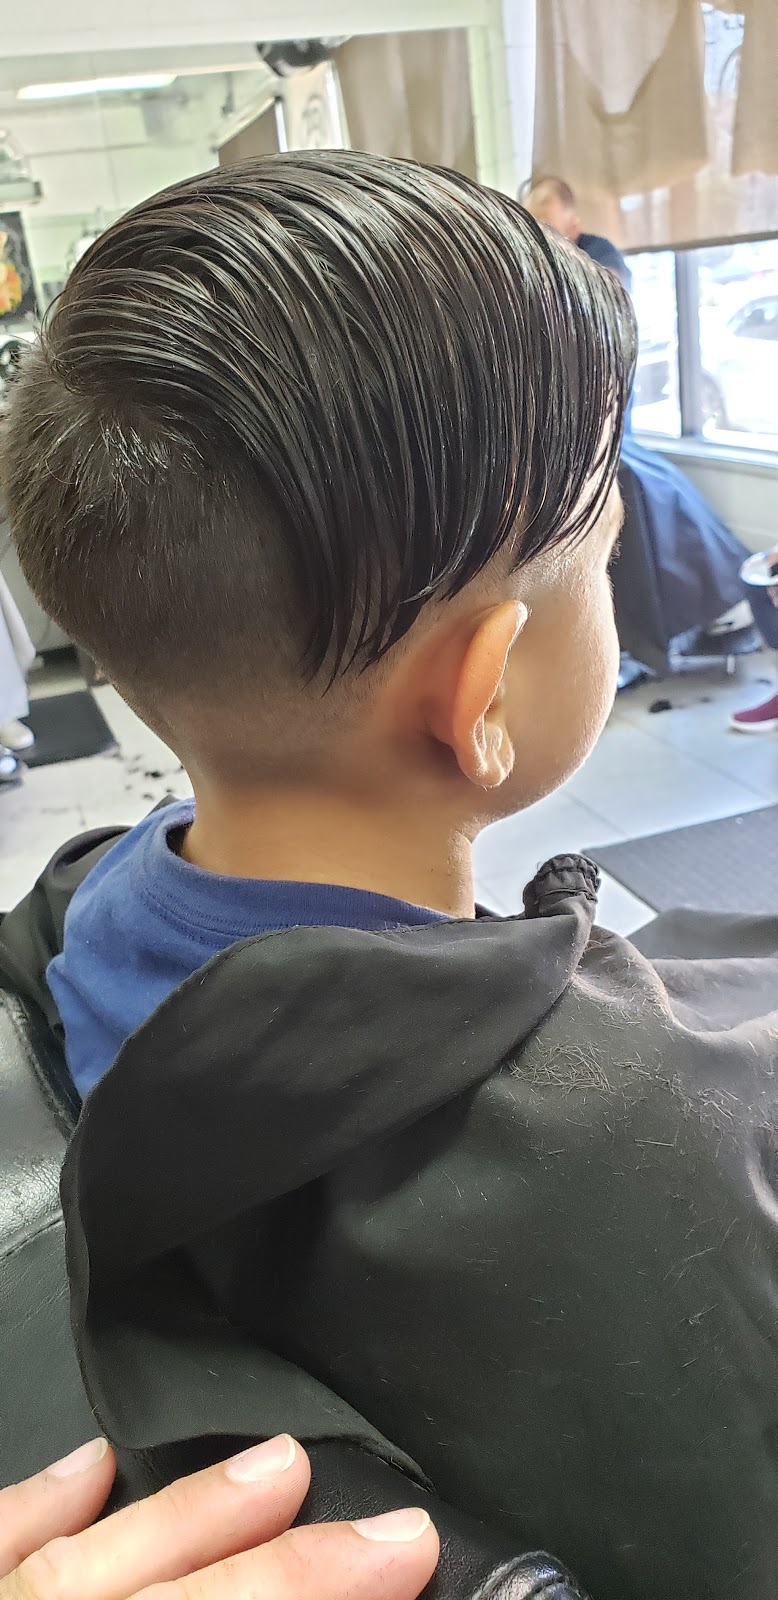 Straight Edge and Cuts - hair care    Photo 6 of 9   Address: 9233 Telegraph Rd, Pico Rivera, CA 90660, USA   Phone: (562) 271-7758